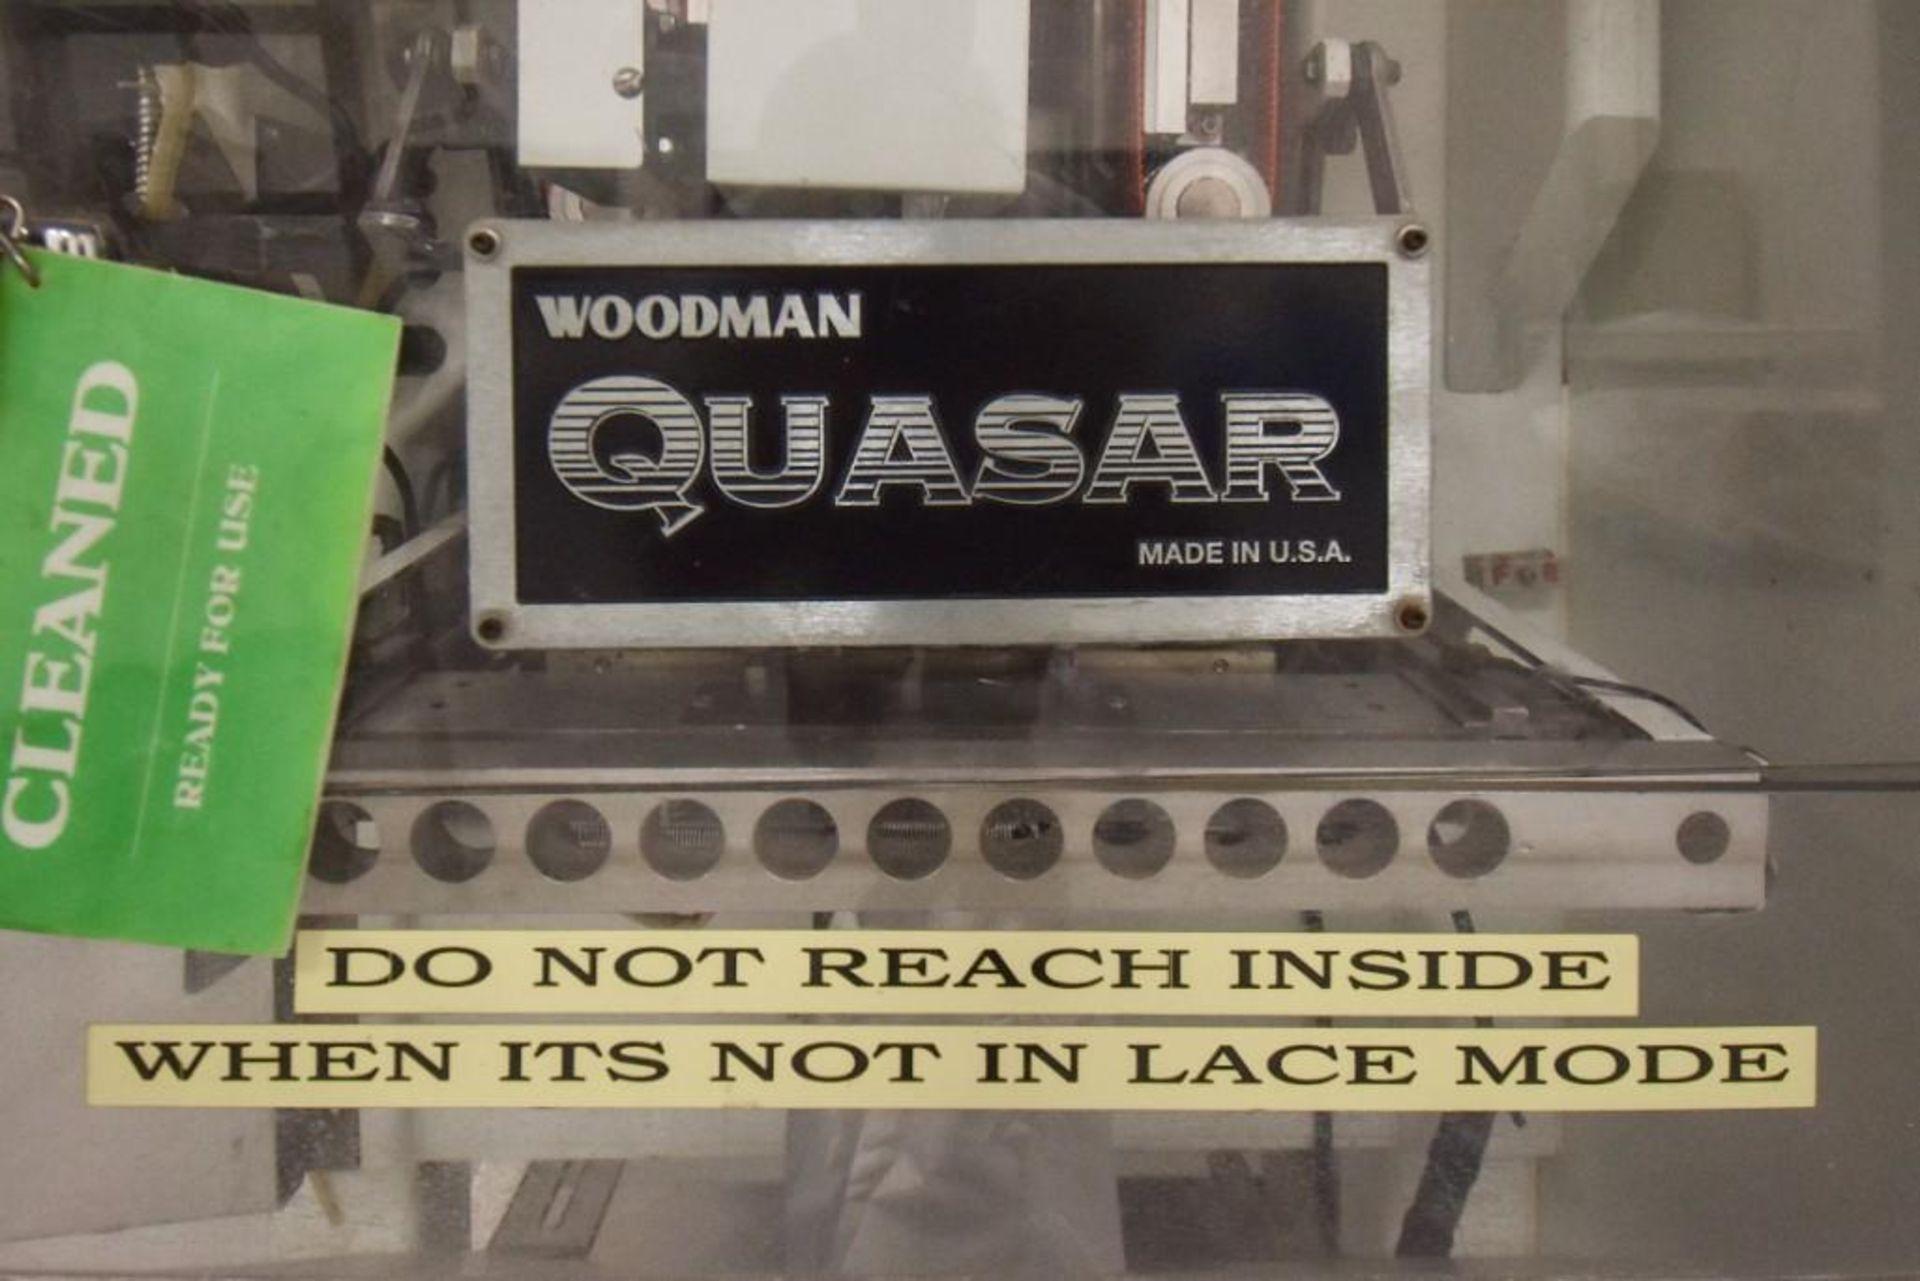 Quasar Vertical Form Fill & Seal Machine - Image 2 of 12